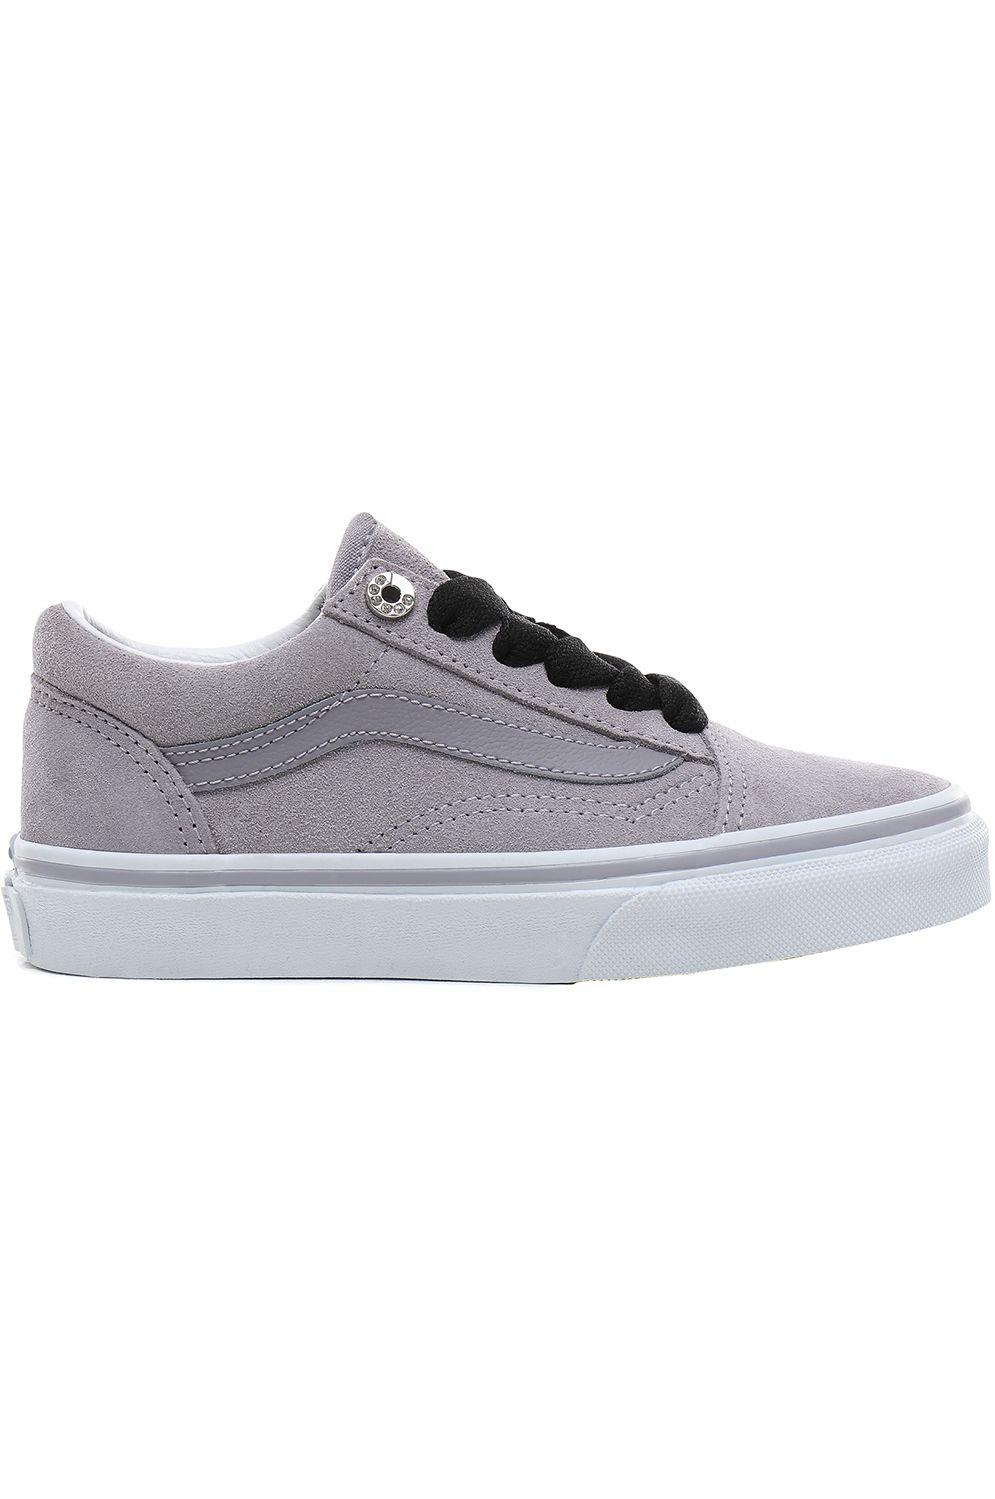 Vans Shoes OLD SKOOL (Jewel Eyelets) Lilac Gray/True White